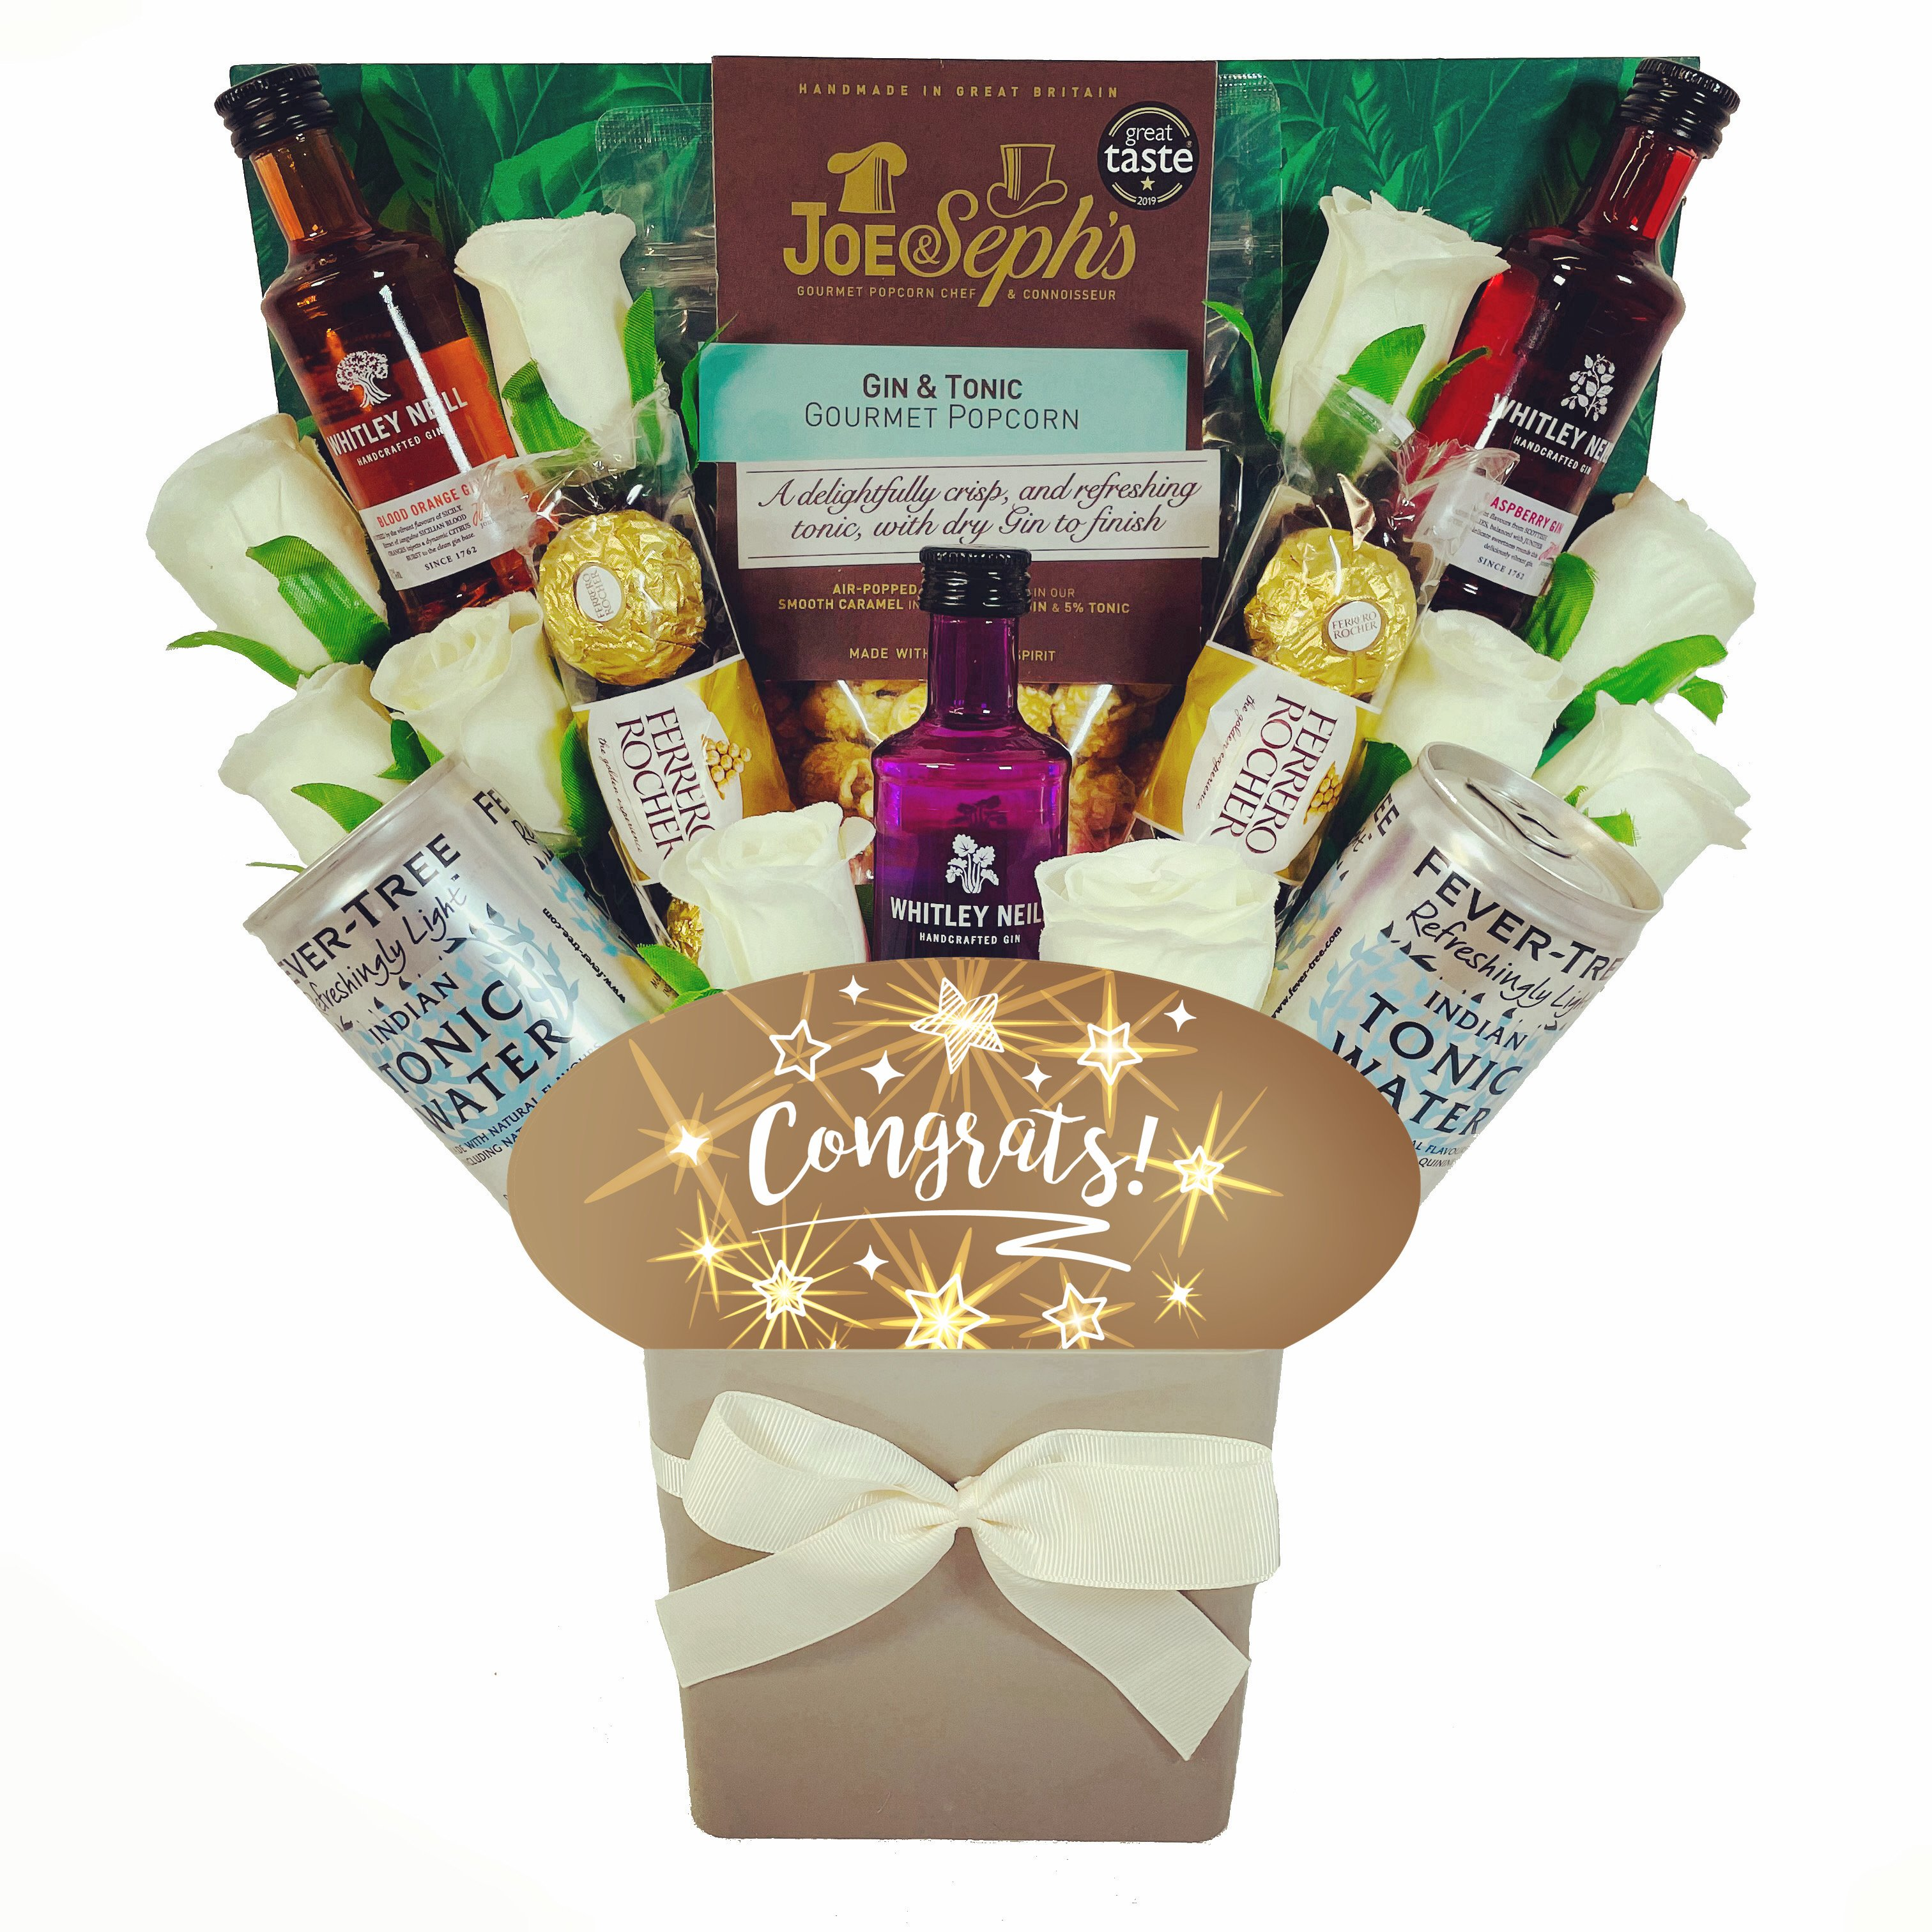 The Congrats Whitley Neill Gin & Tonic Bouquet